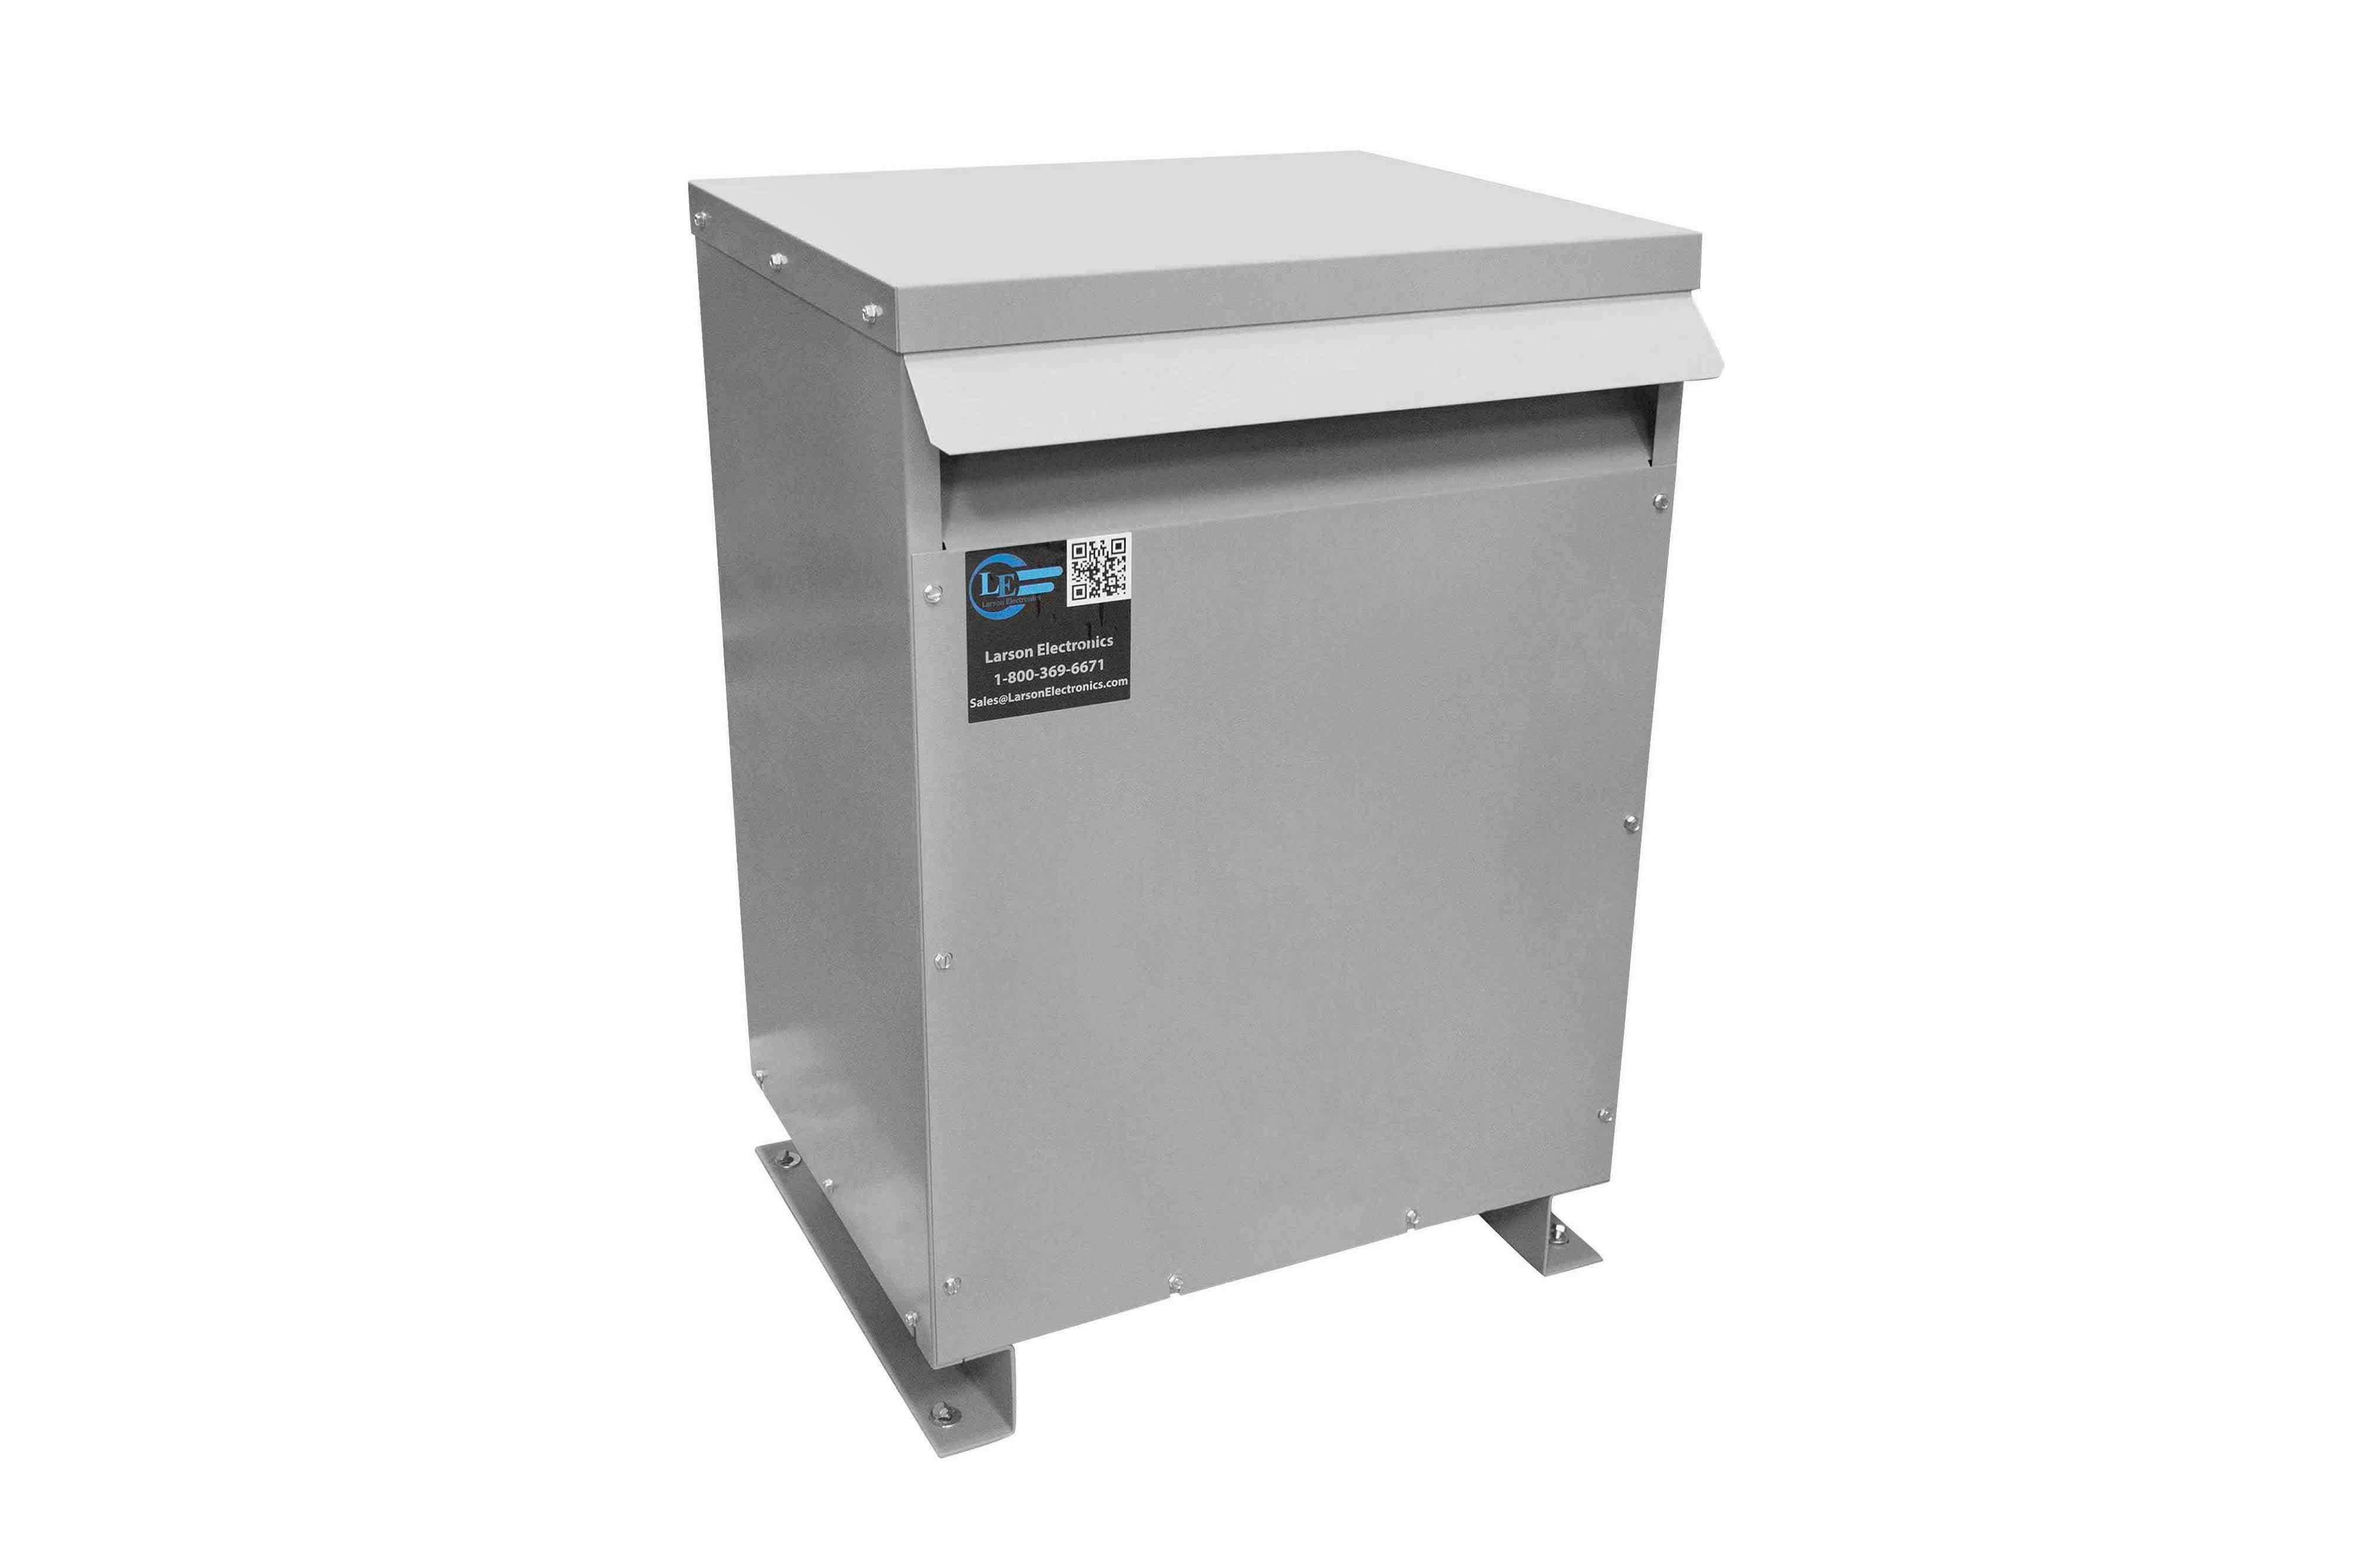 115 kVA 3PH Isolation Transformer, 600V Wye Primary, 415Y/240 Wye-N Secondary, N3R, Ventilated, 60 Hz